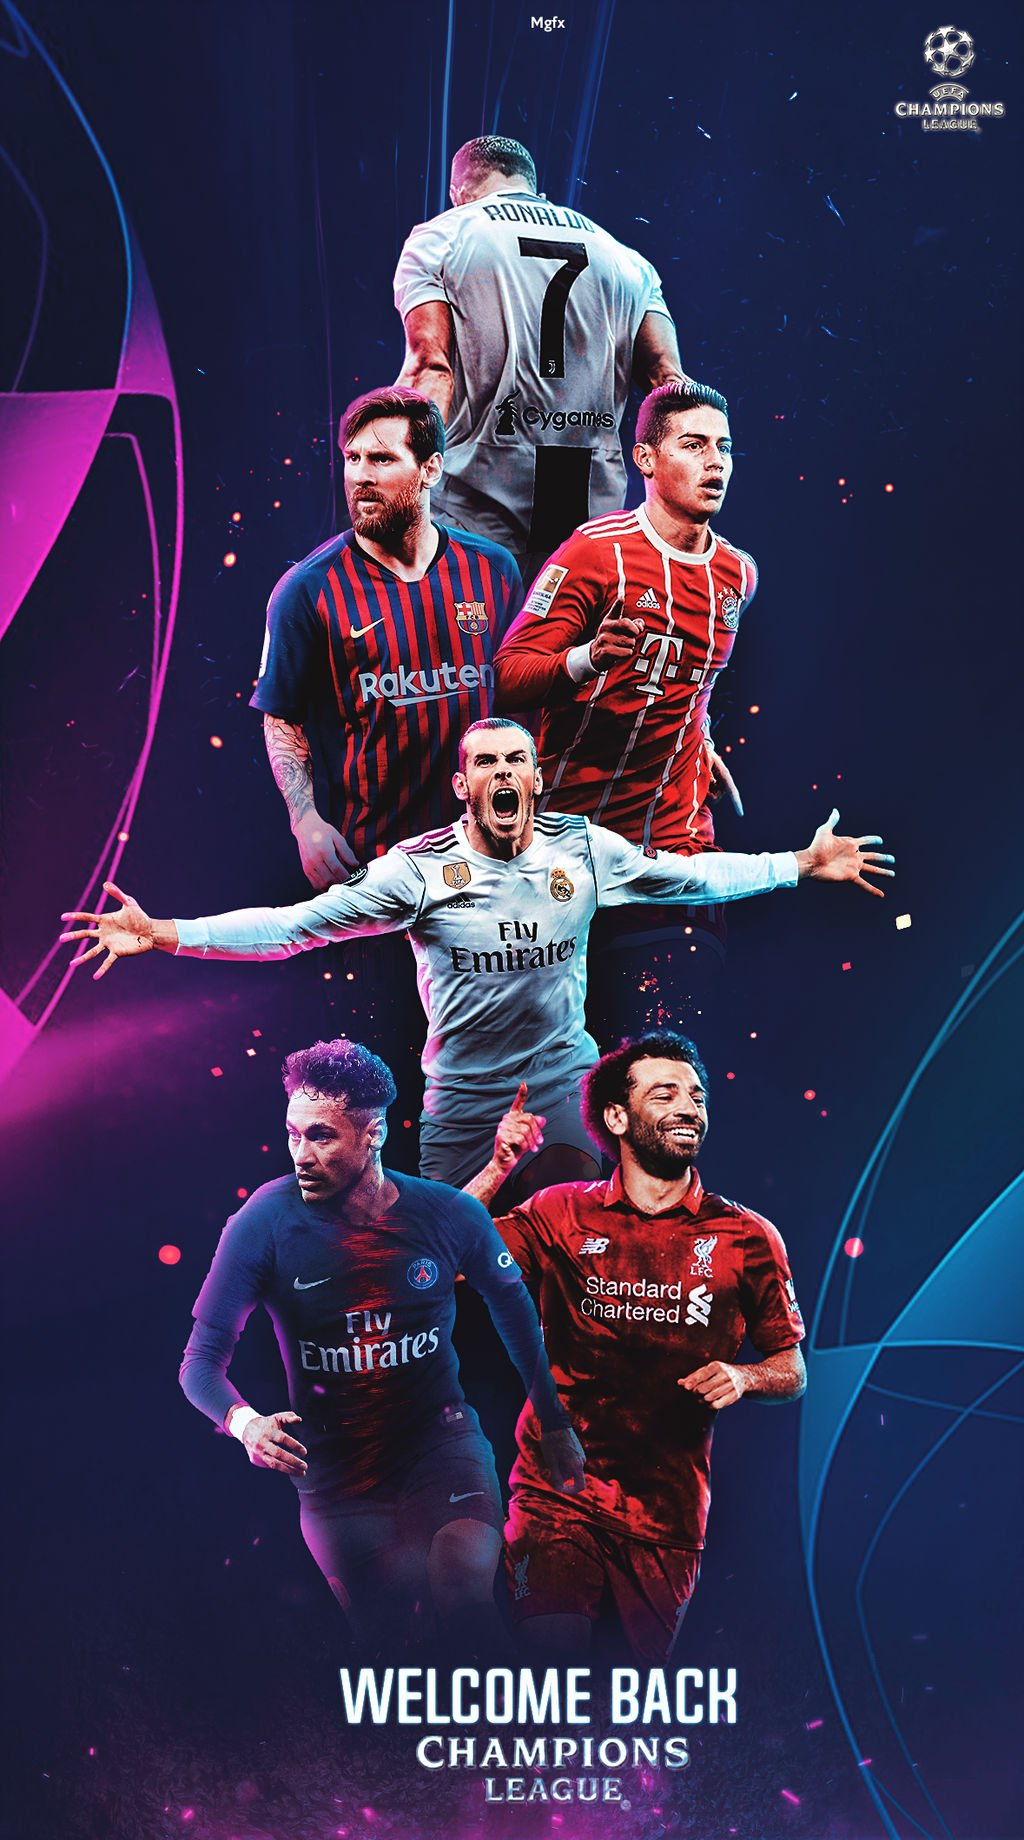 wallpaper uefa champions league lockscreen 2019 by 1024x1840